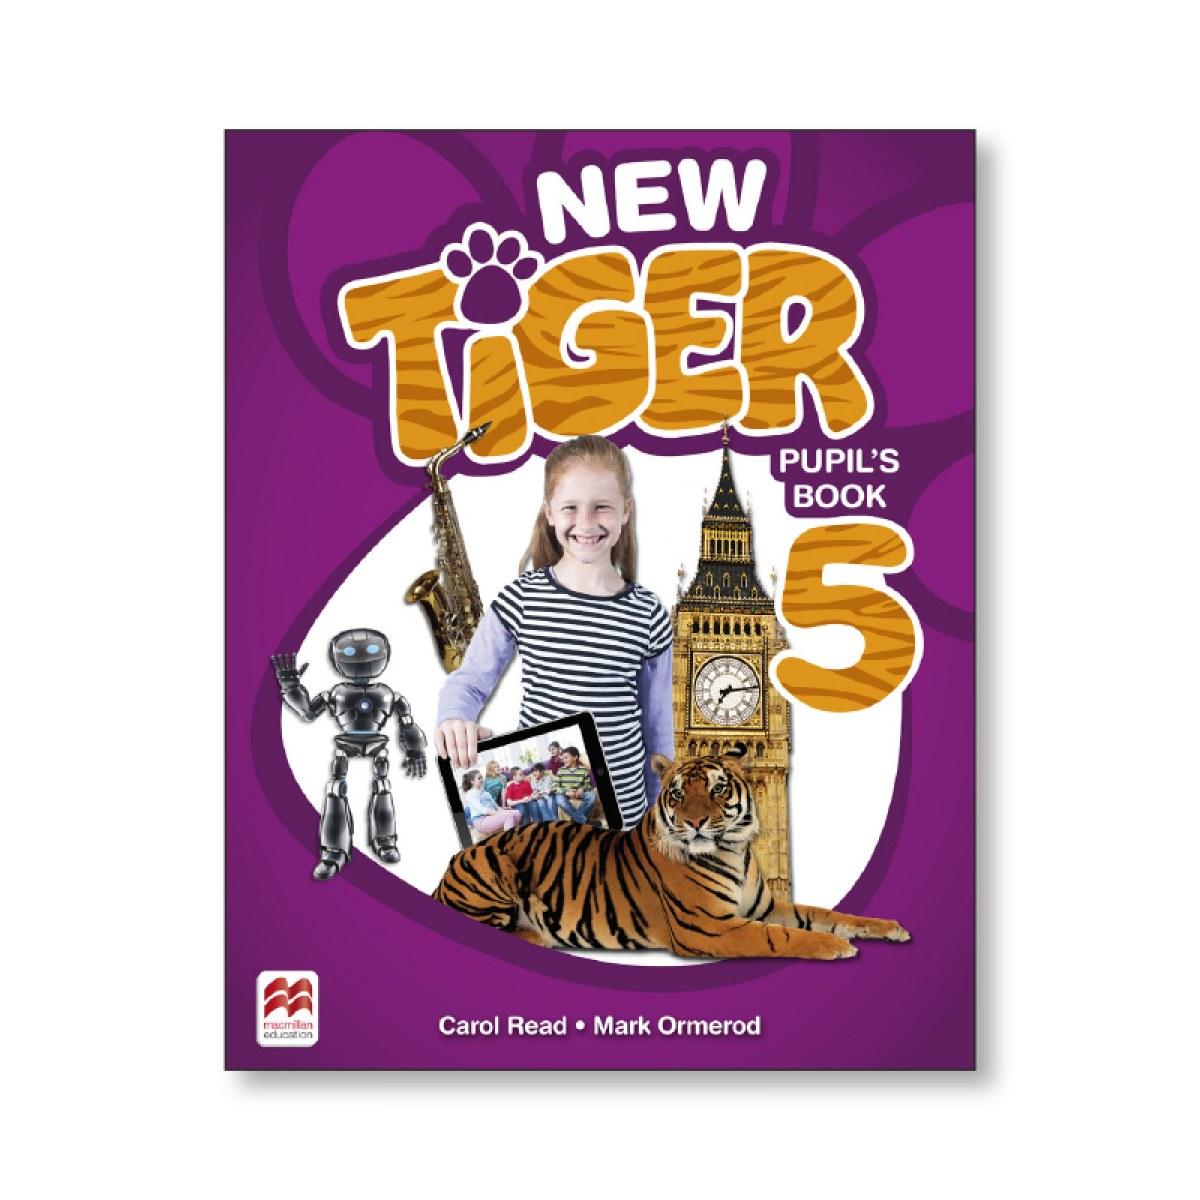 NEW TIGER 5 PUPIL S BOOK 9781380011152